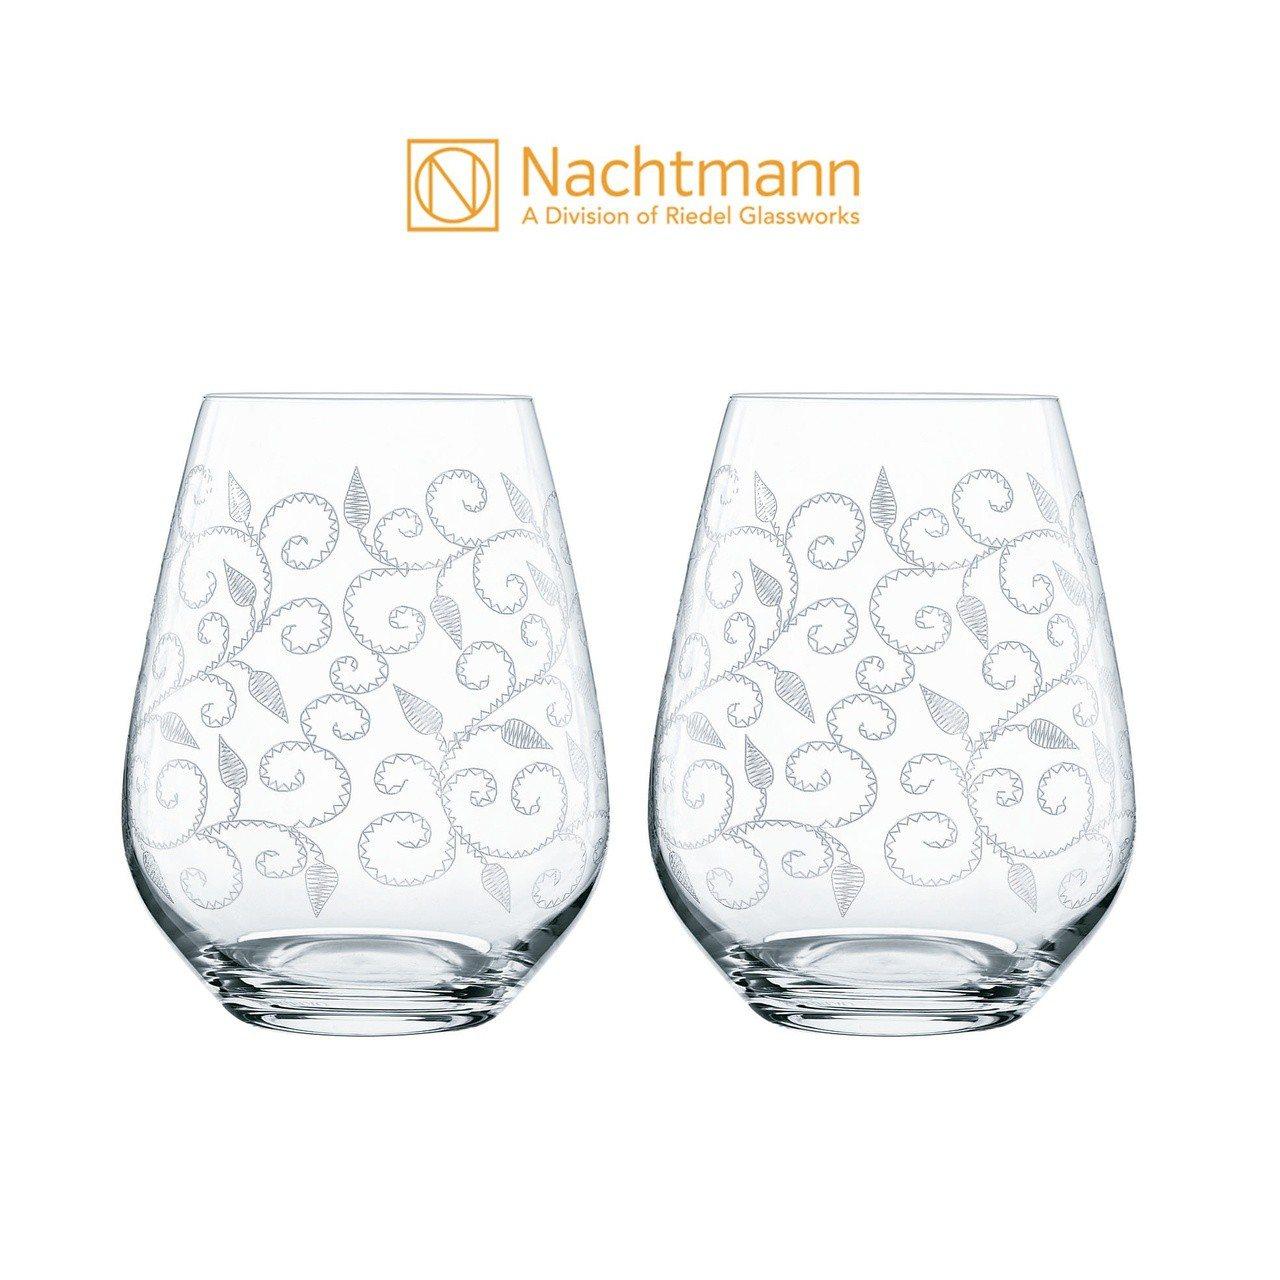 Nachtmann_Delight情趣酒杯。 旺代企業/提供